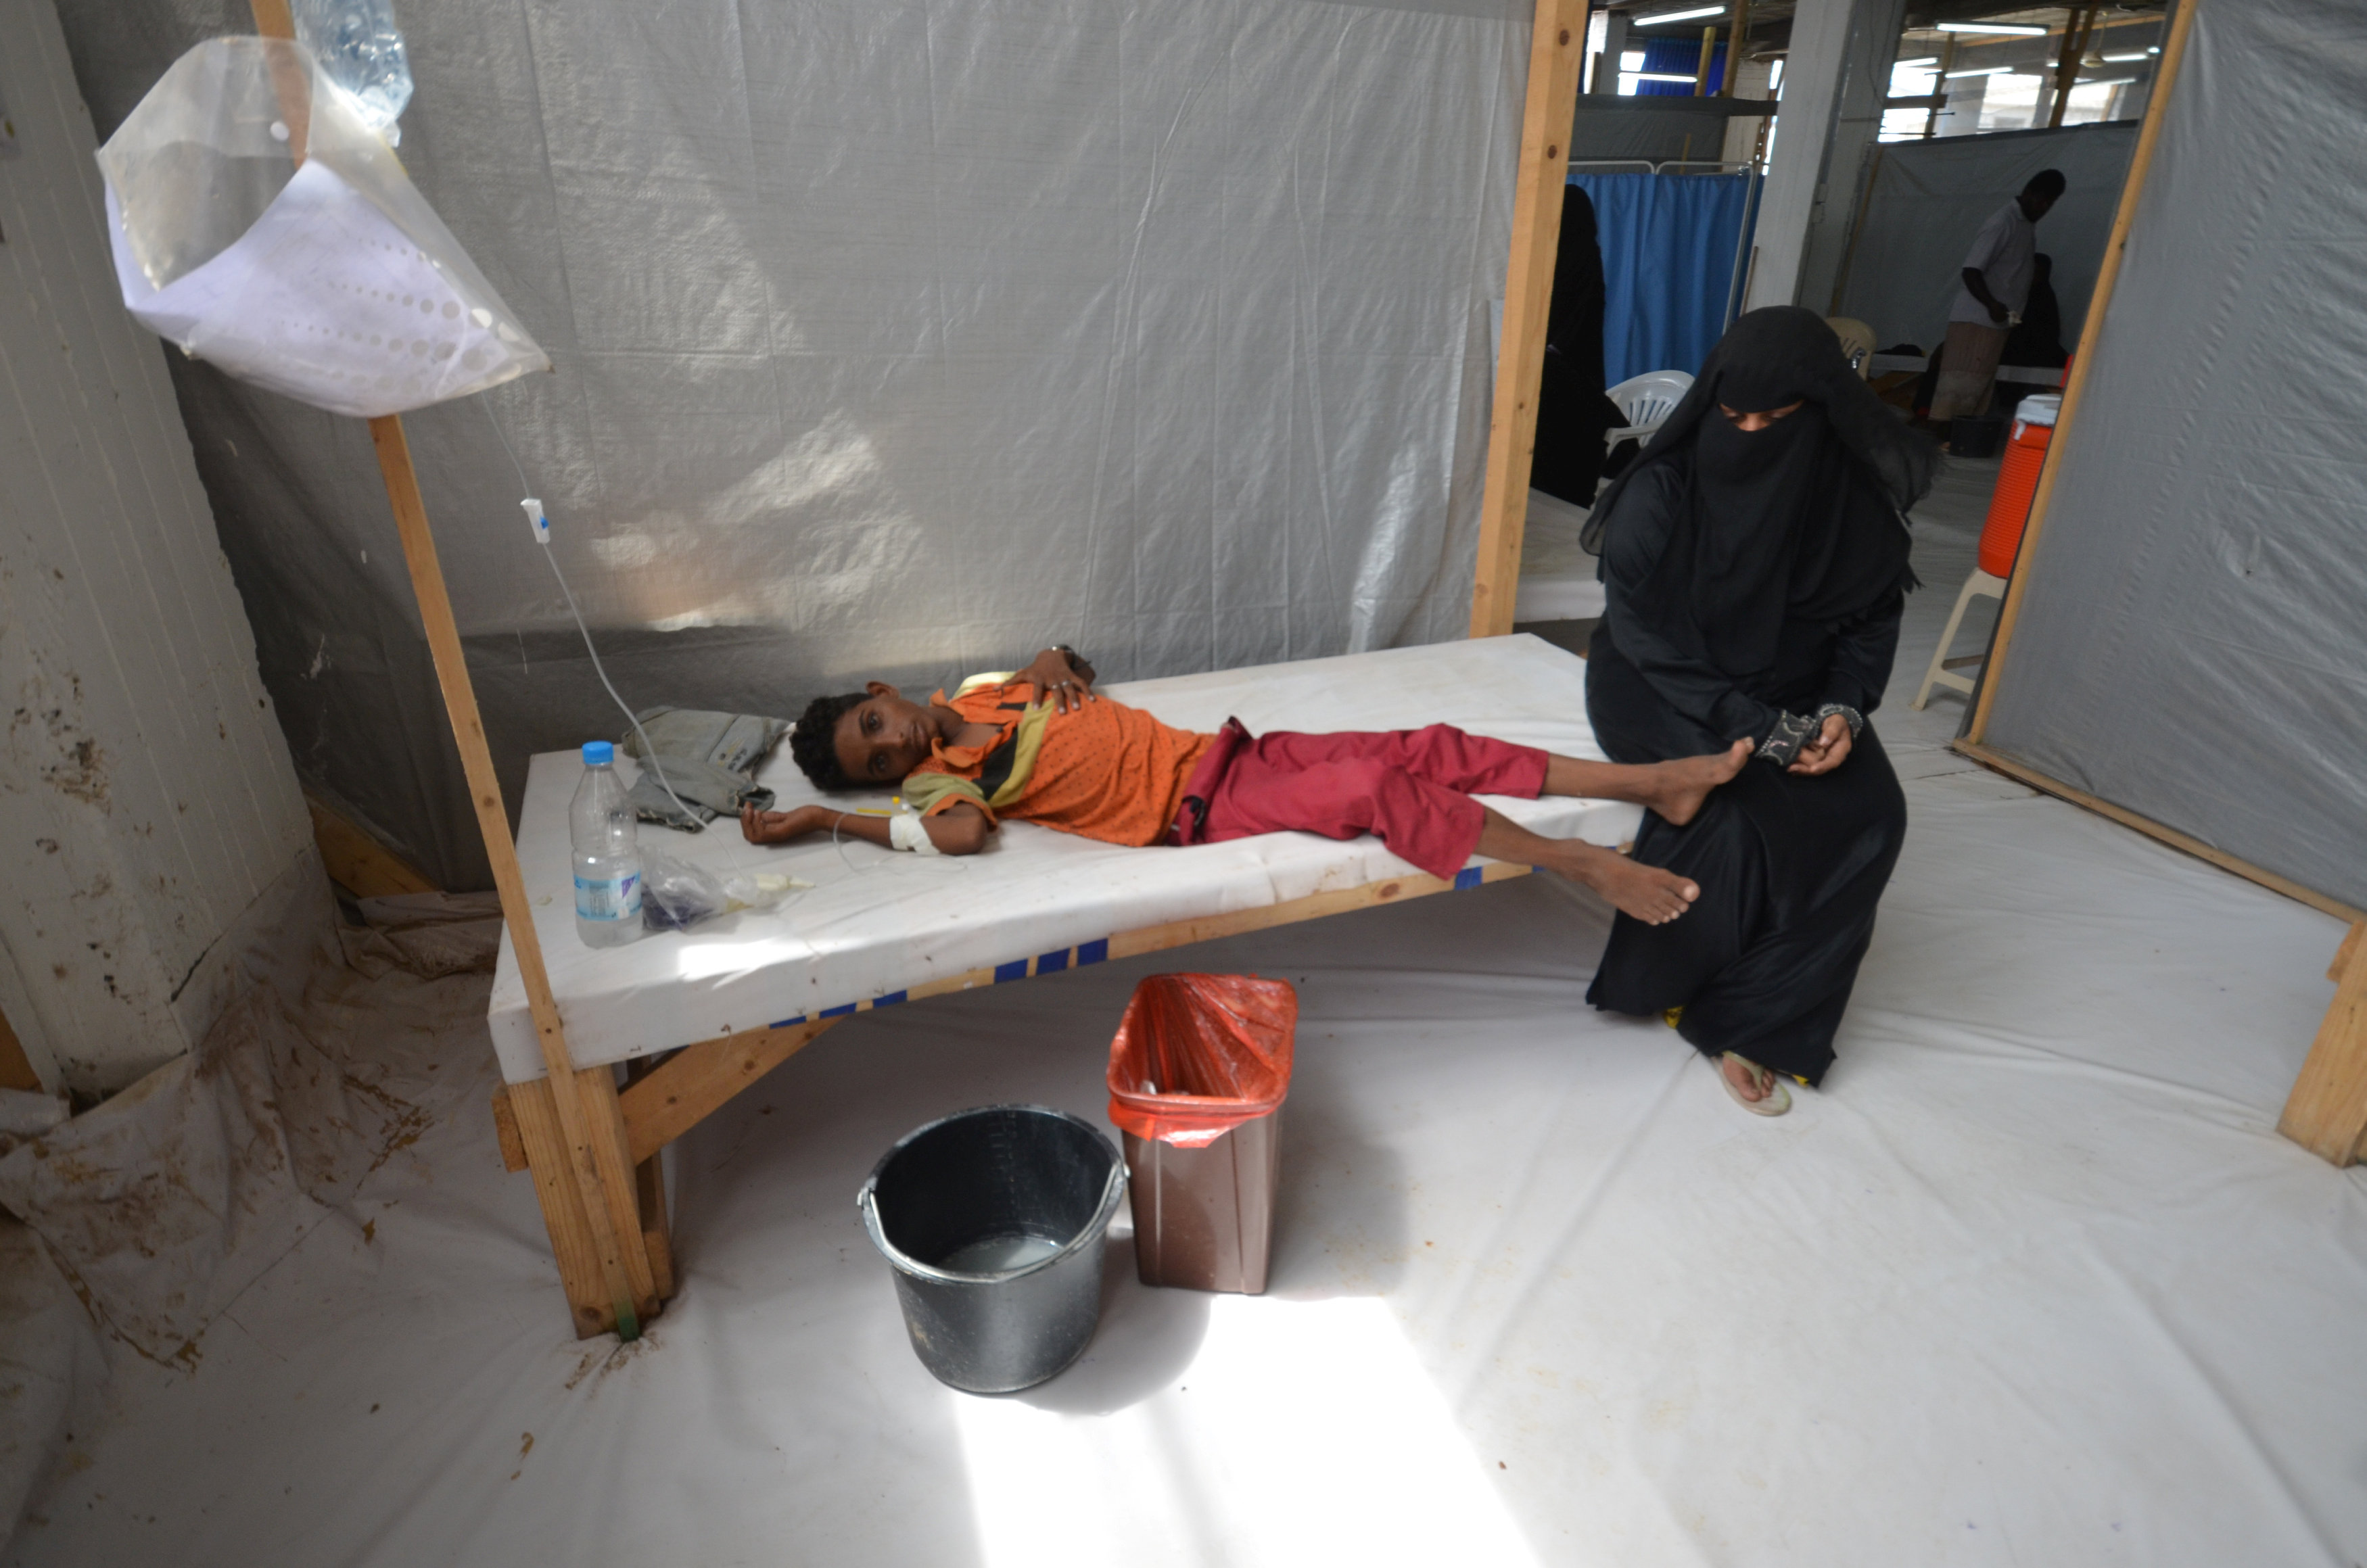 Fighting, cholera wreaks misery in Yemen as shortages cripple health system